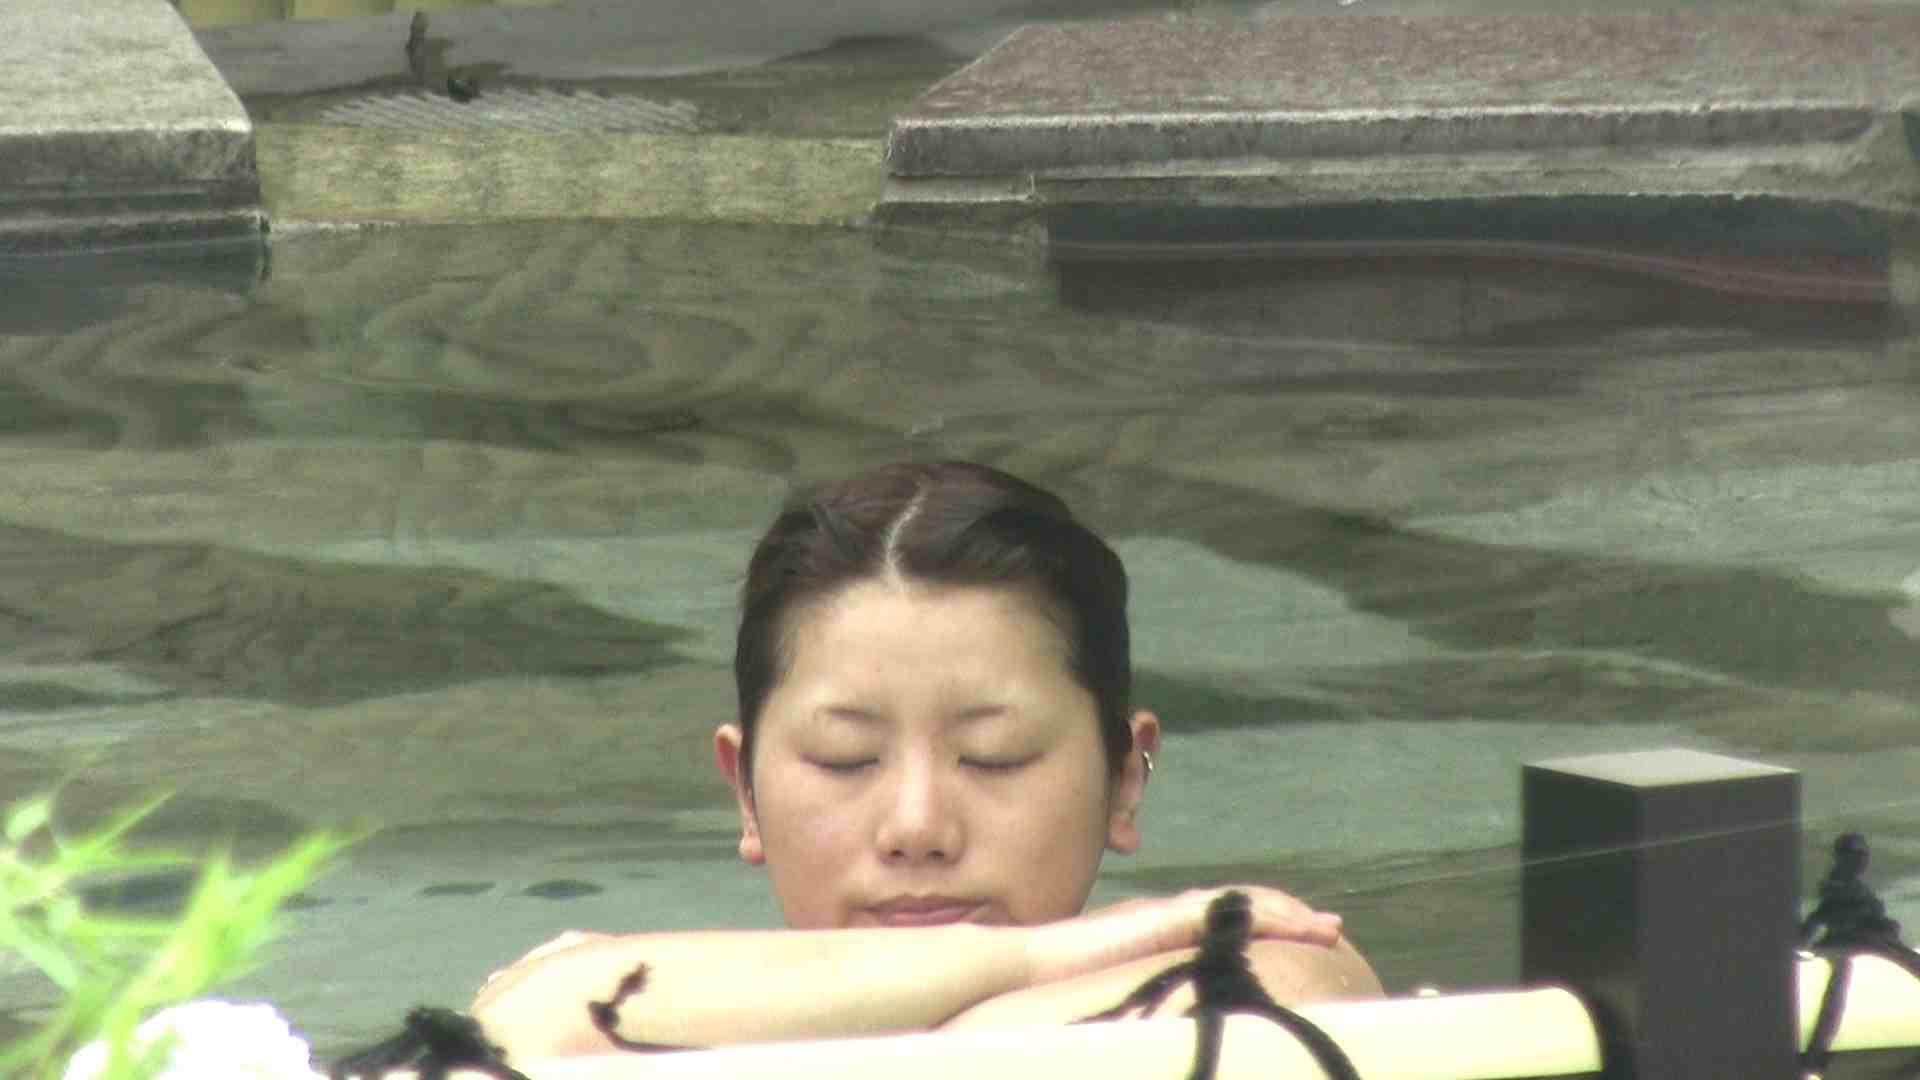 Aquaな露天風呂Vol.19【VIP】 盗撮 | HなOL  88pic 4